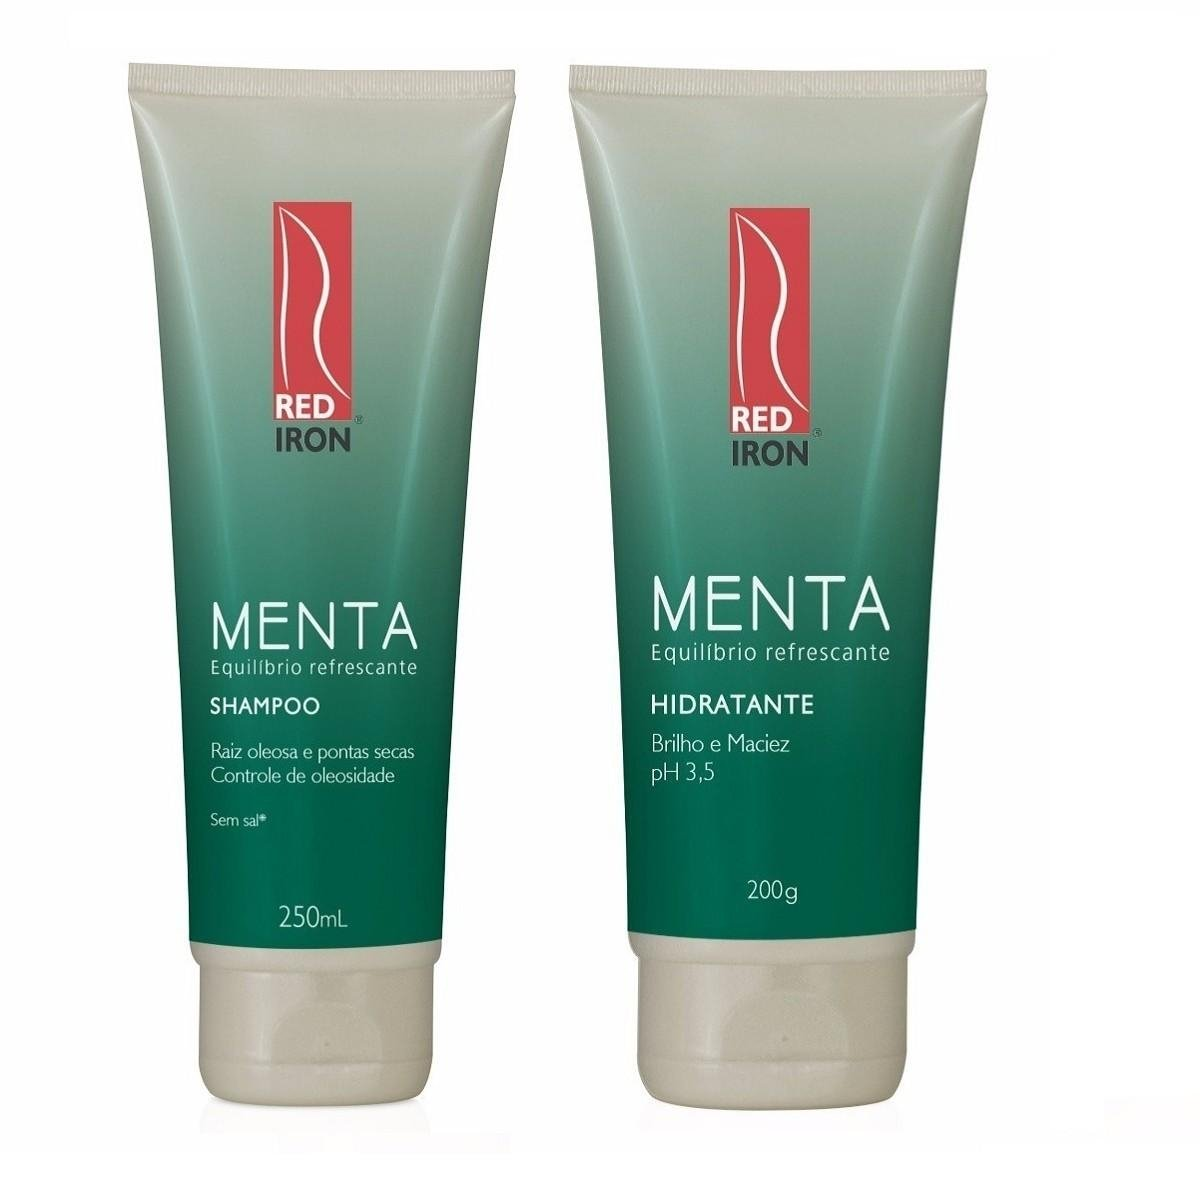 Red Iron Menta Equilíbrio Refrescante Kit Shampoo 250ml + Hidratante 200ml